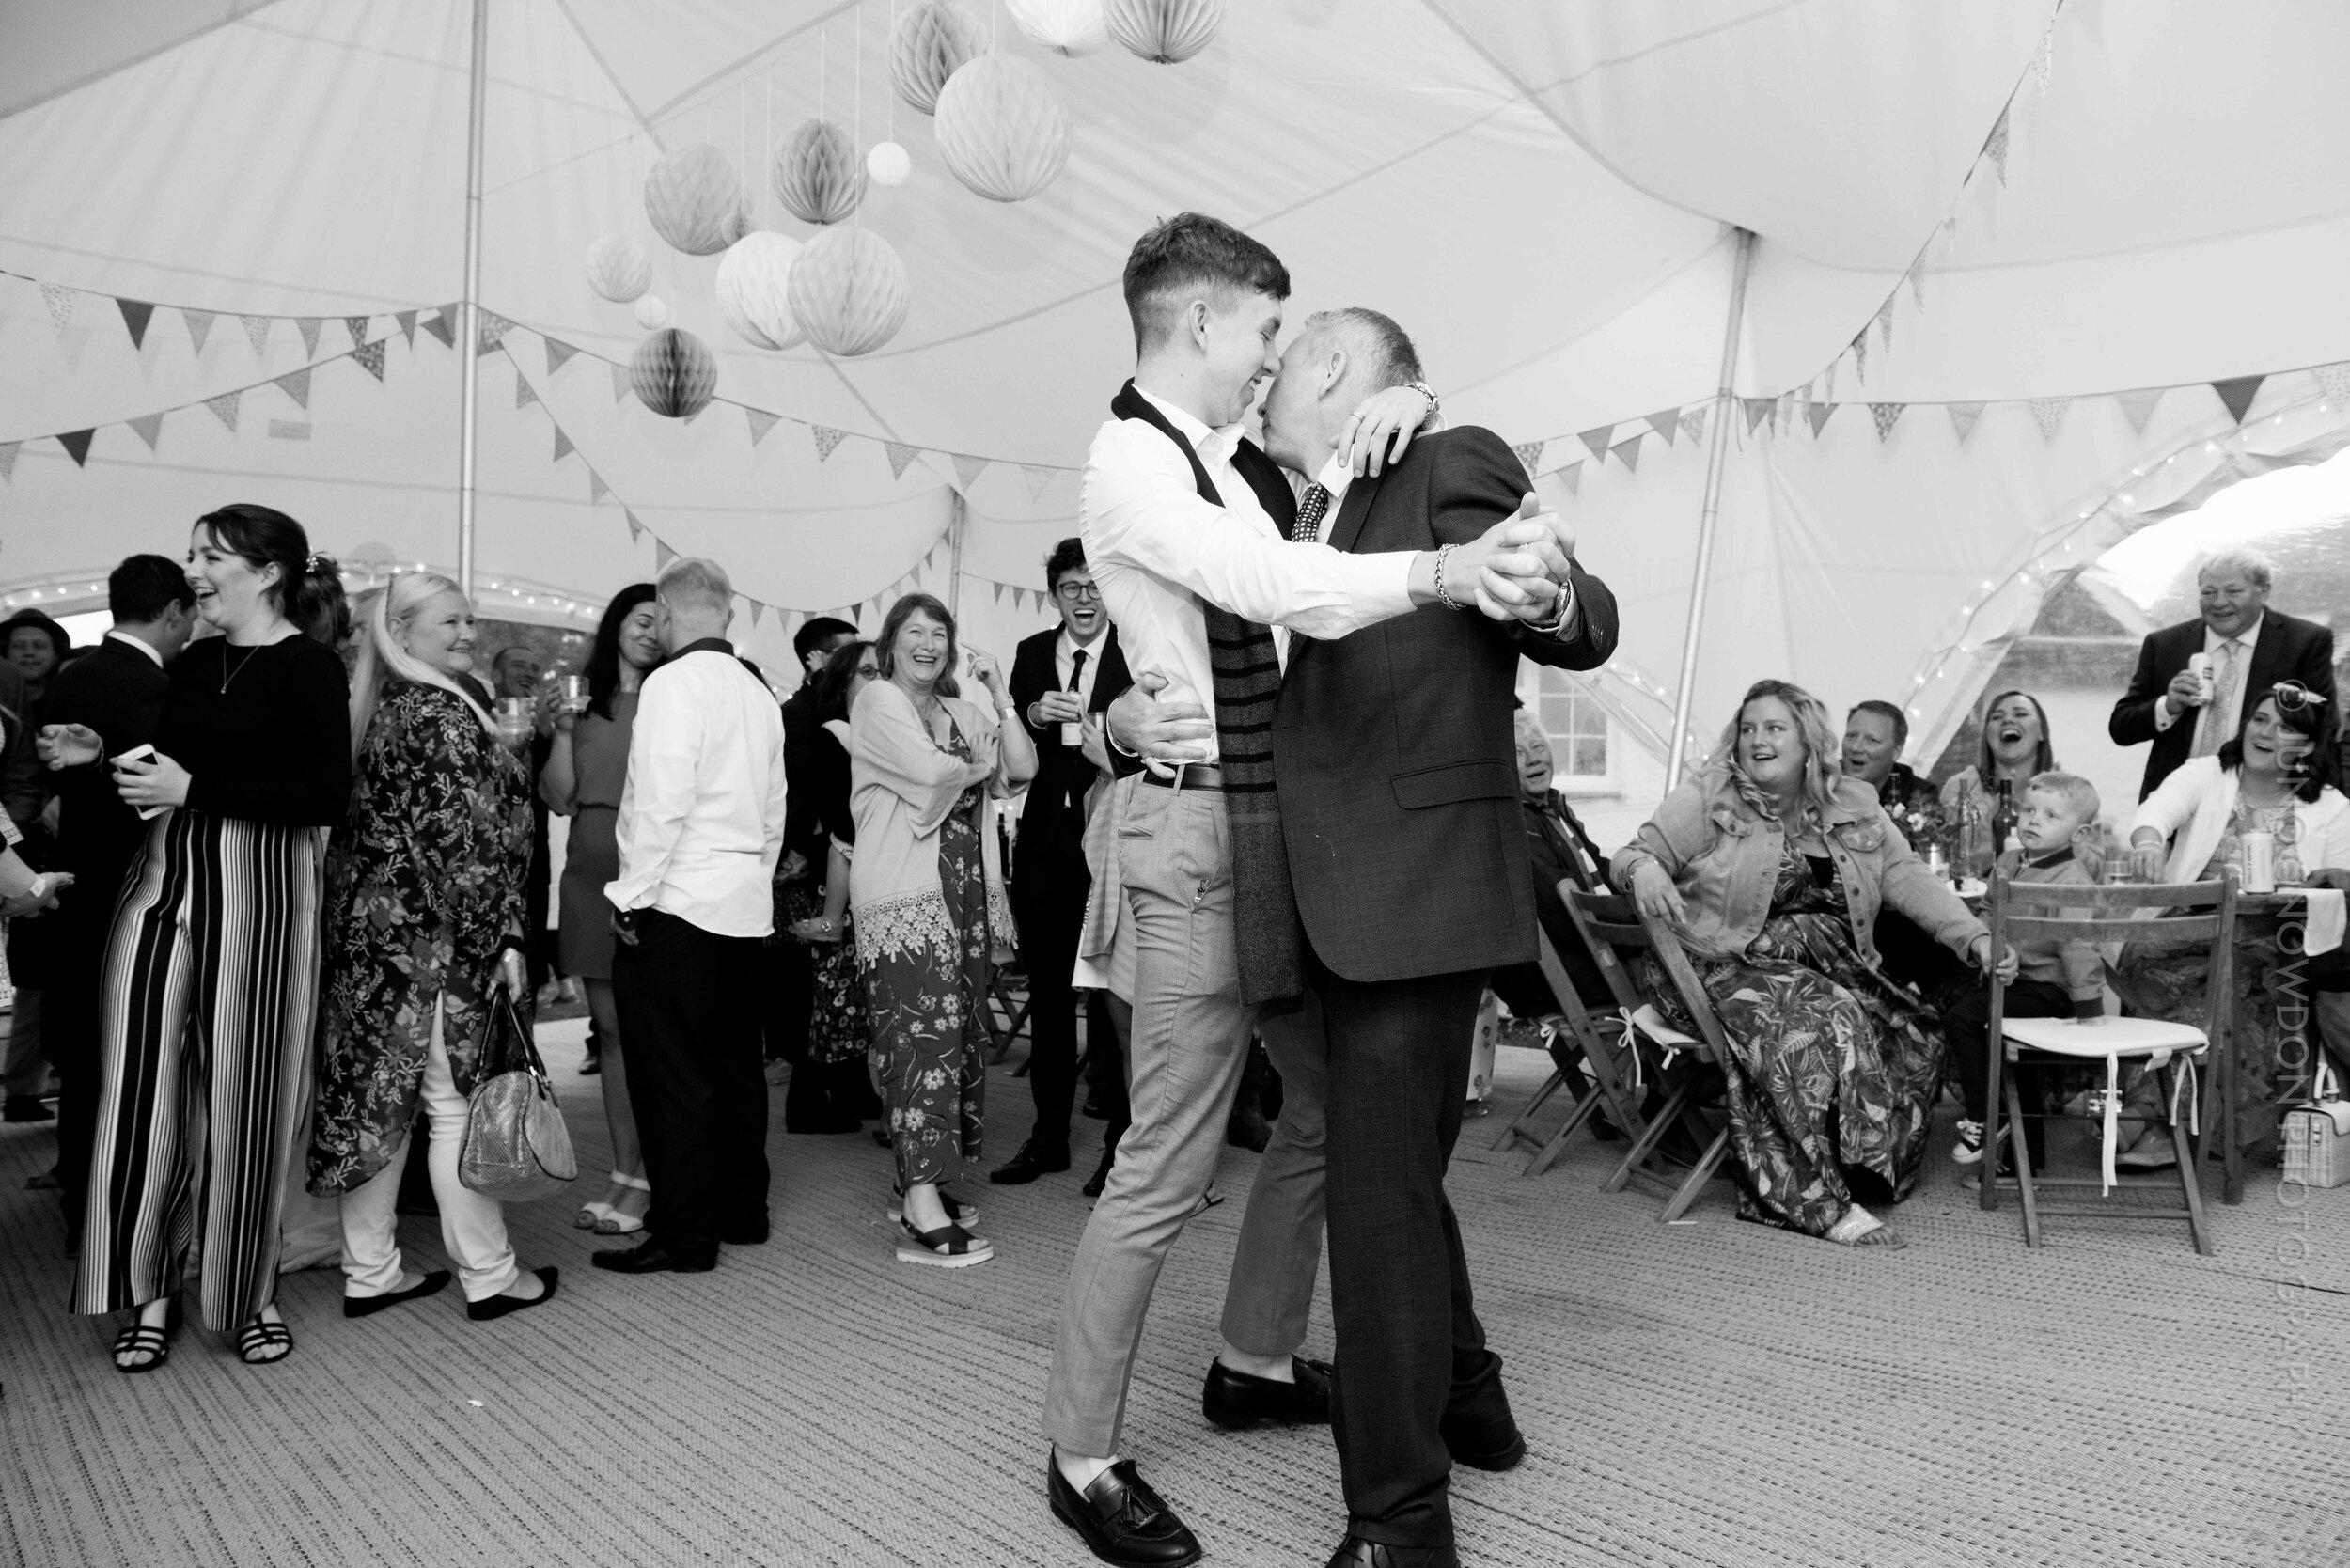 juno-snowdon-photography-wedding-8434.jpg